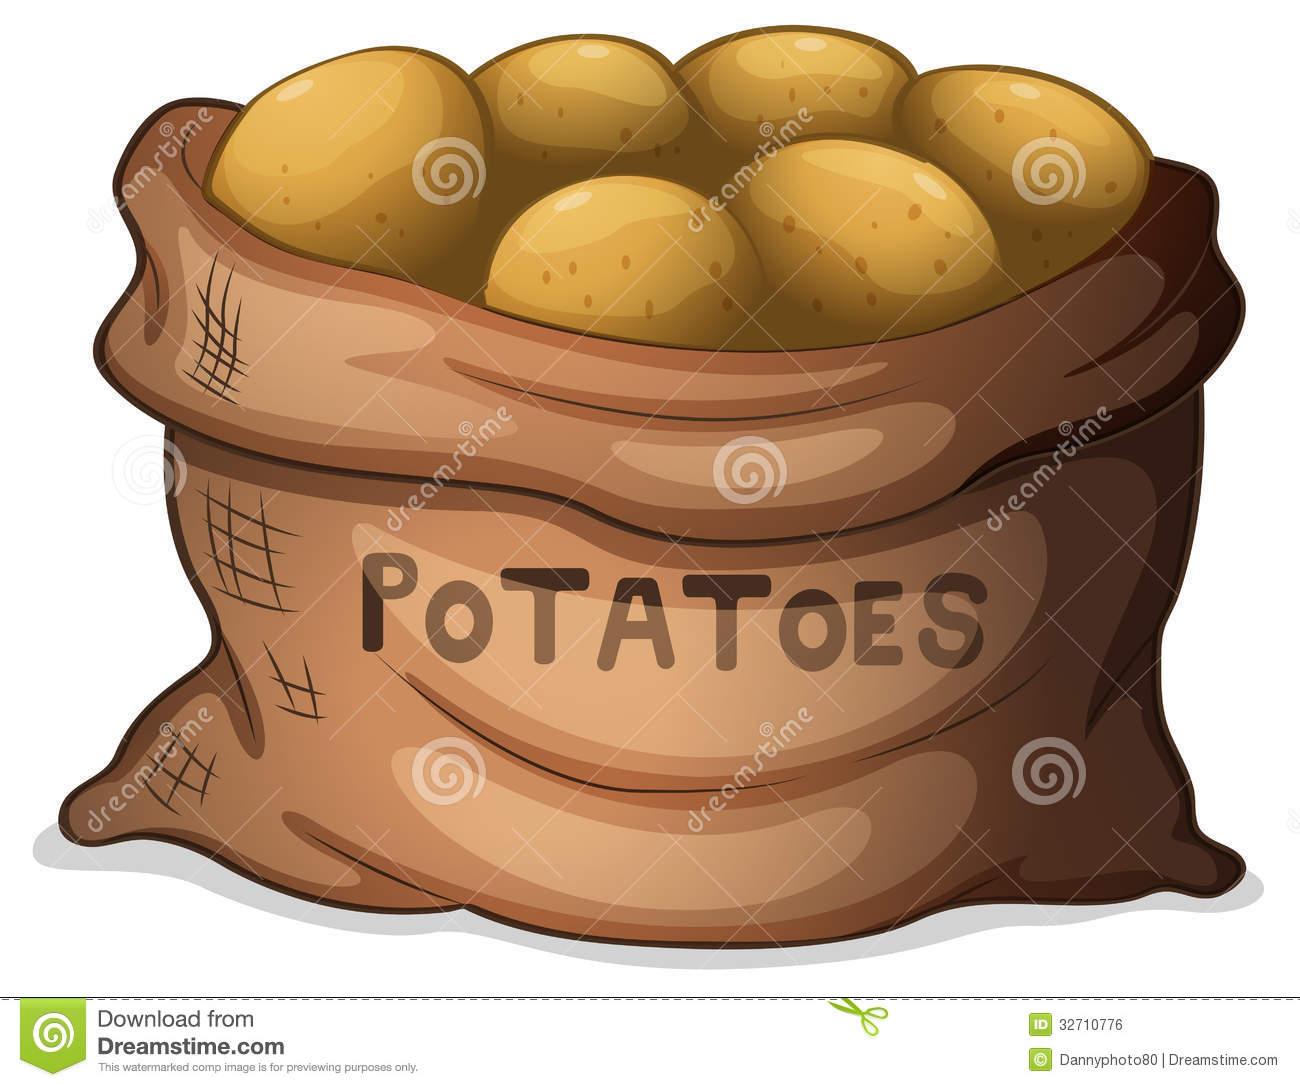 358 Potatoes free clipart.